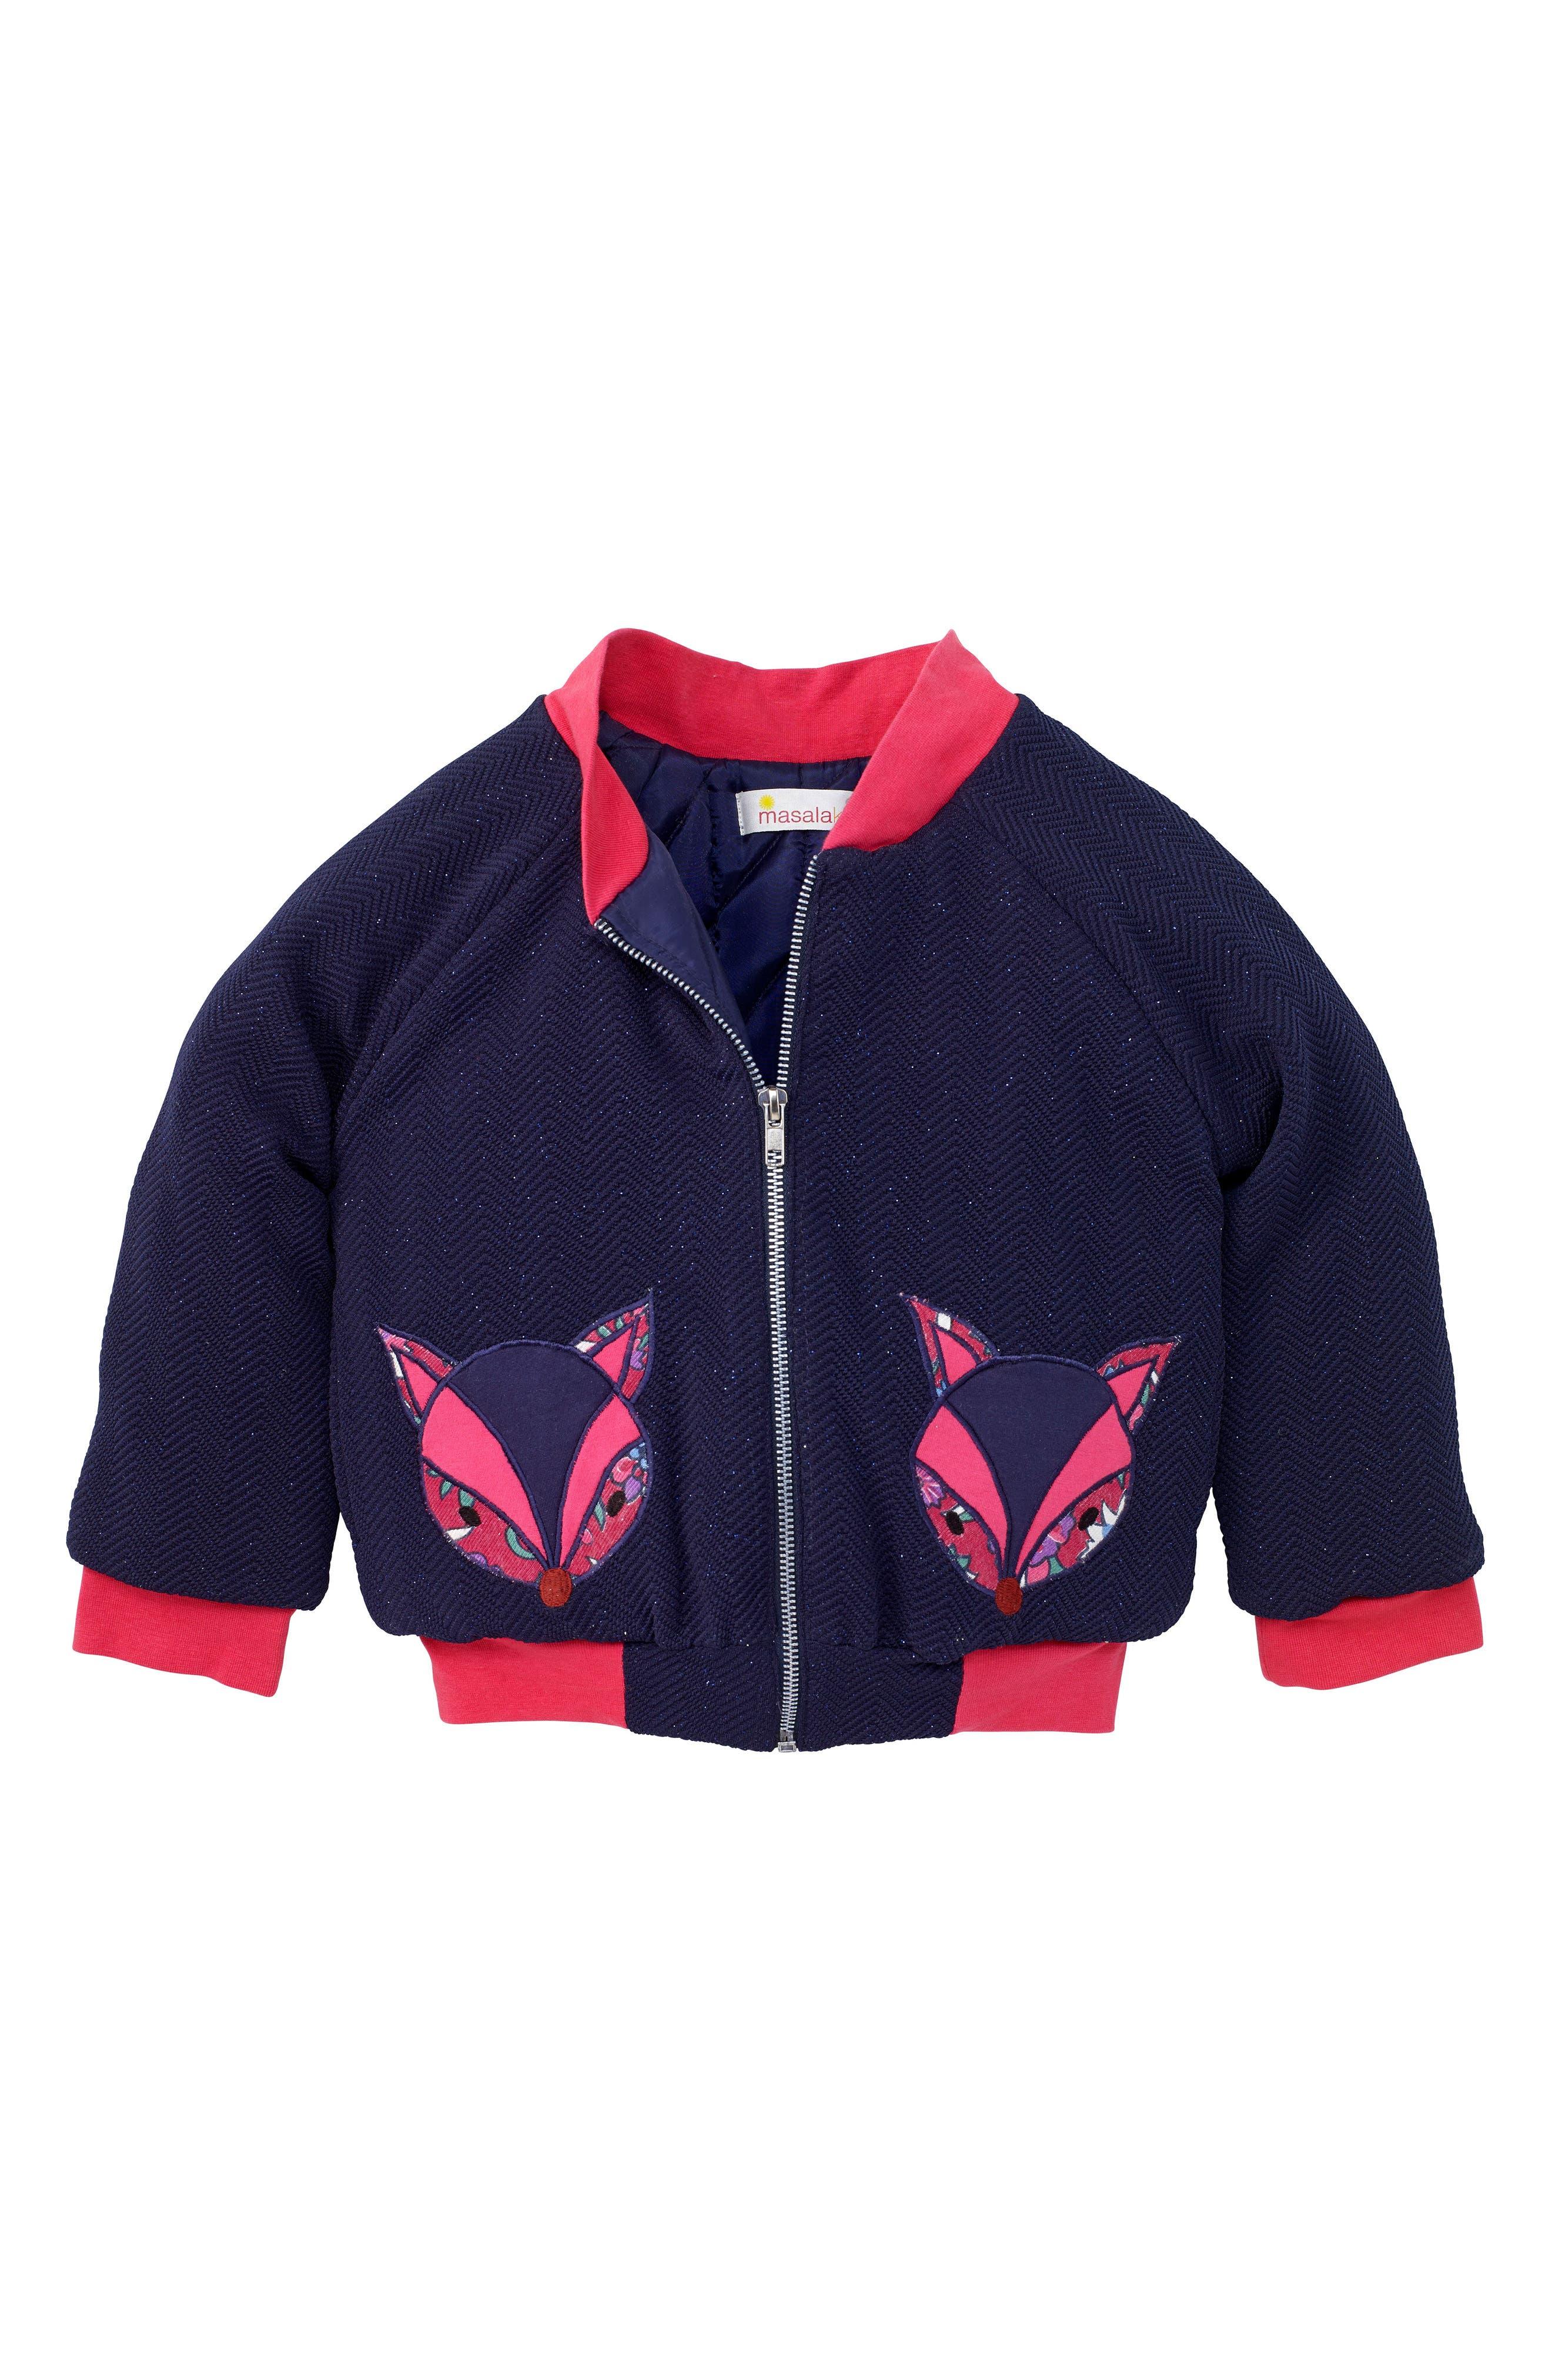 Main Image - Masasla Baby Foxy Bomber Jacket (Toddler Girls, Little Girls & Big Girls)